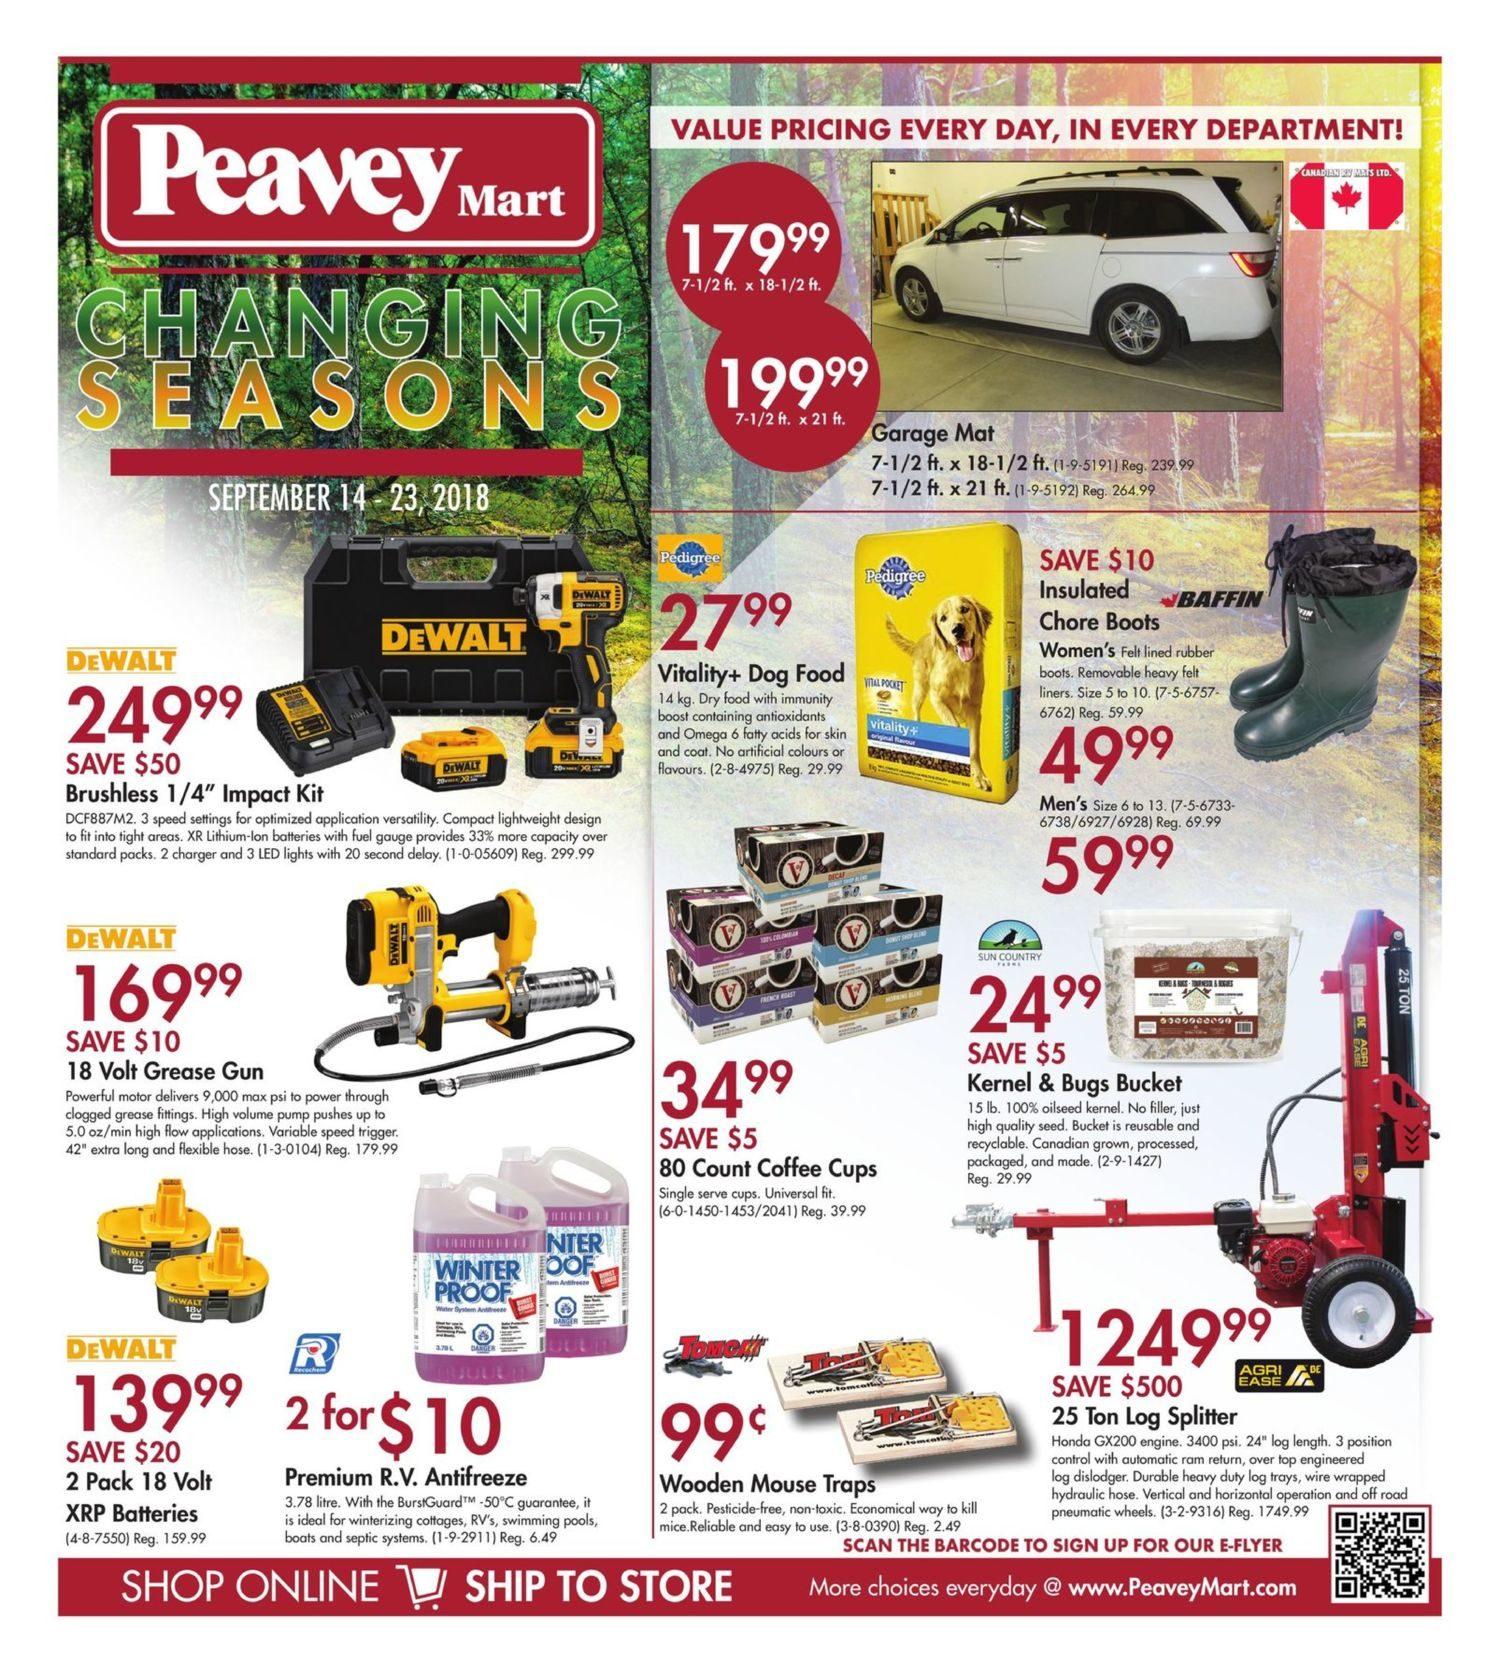 Peaveymart Weekly Flyer Changing Seasons Sep 14 23 Redflagdeals Com